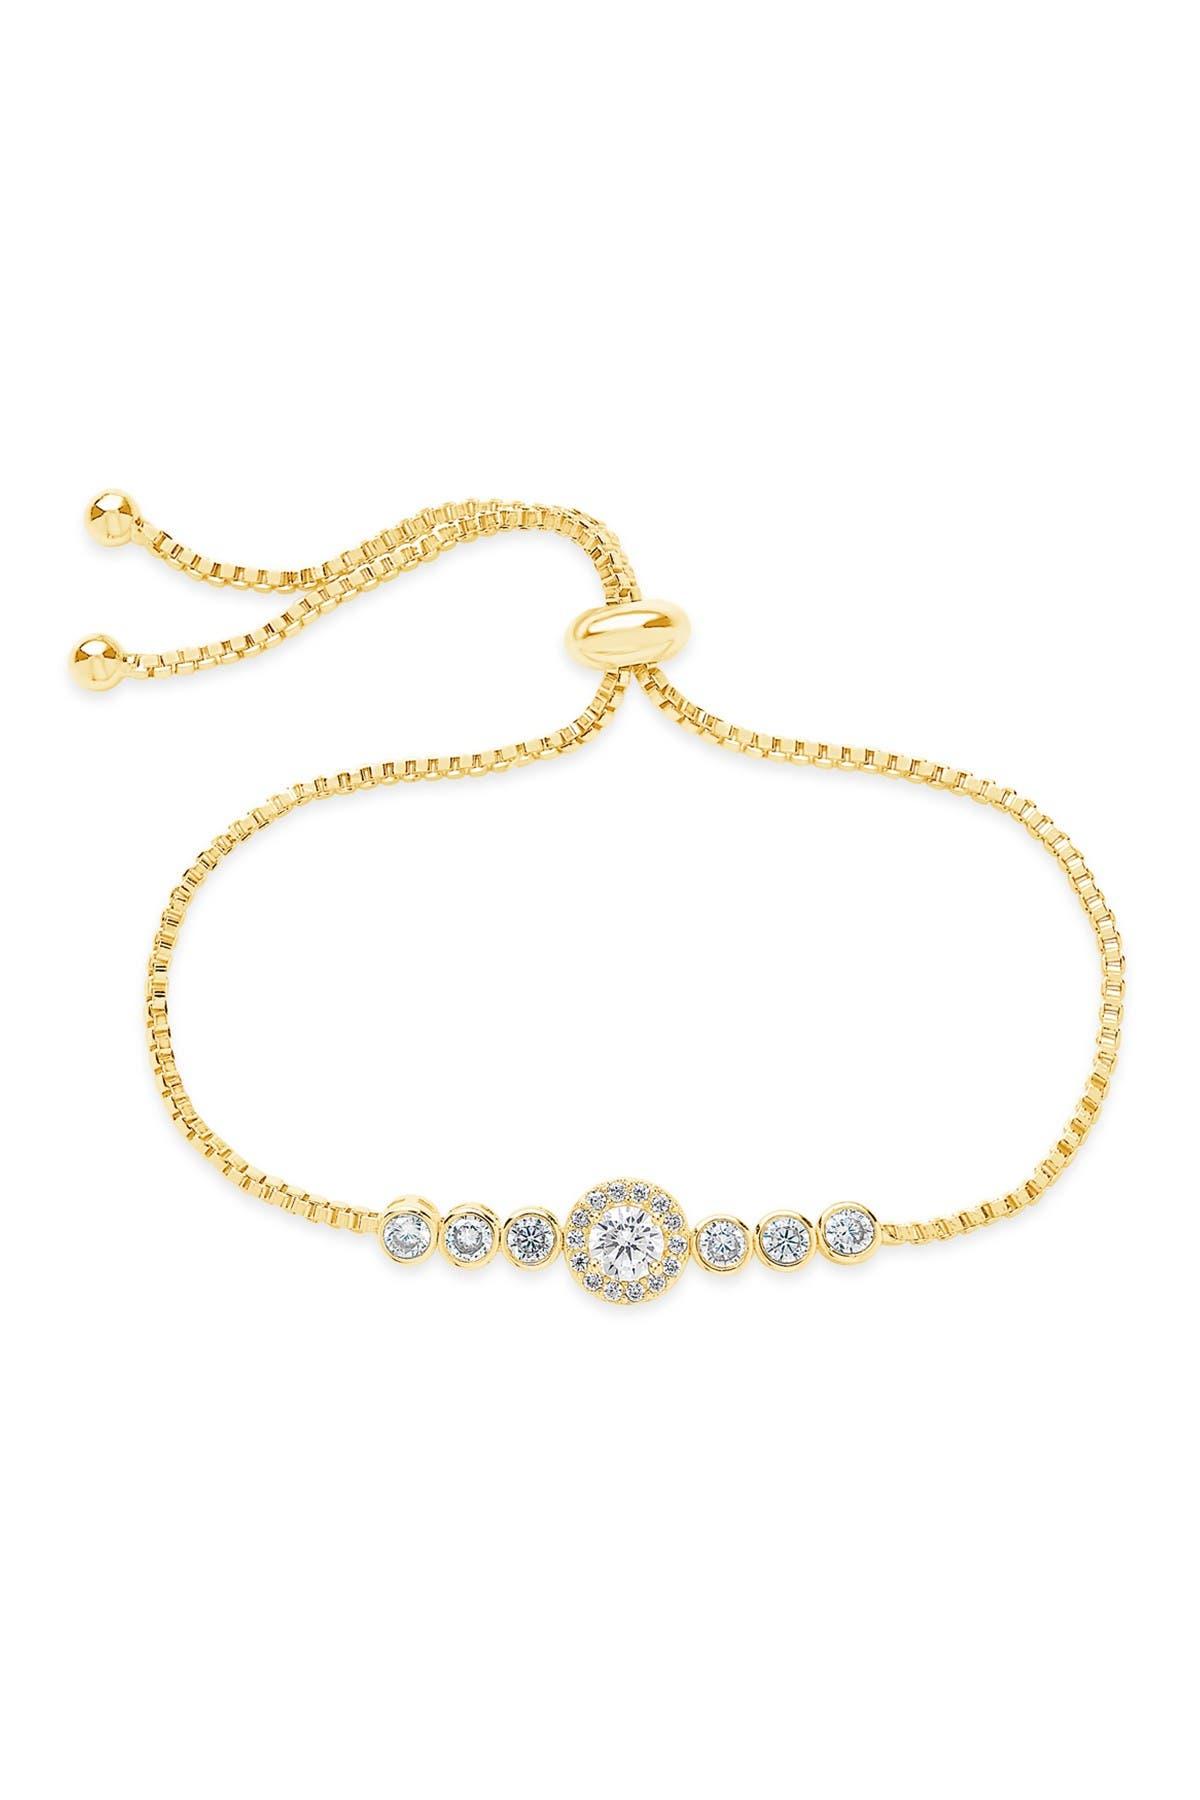 Image of Sterling Forever 14K Gold Plated Brass CZ Circlet Bolo Bracelet